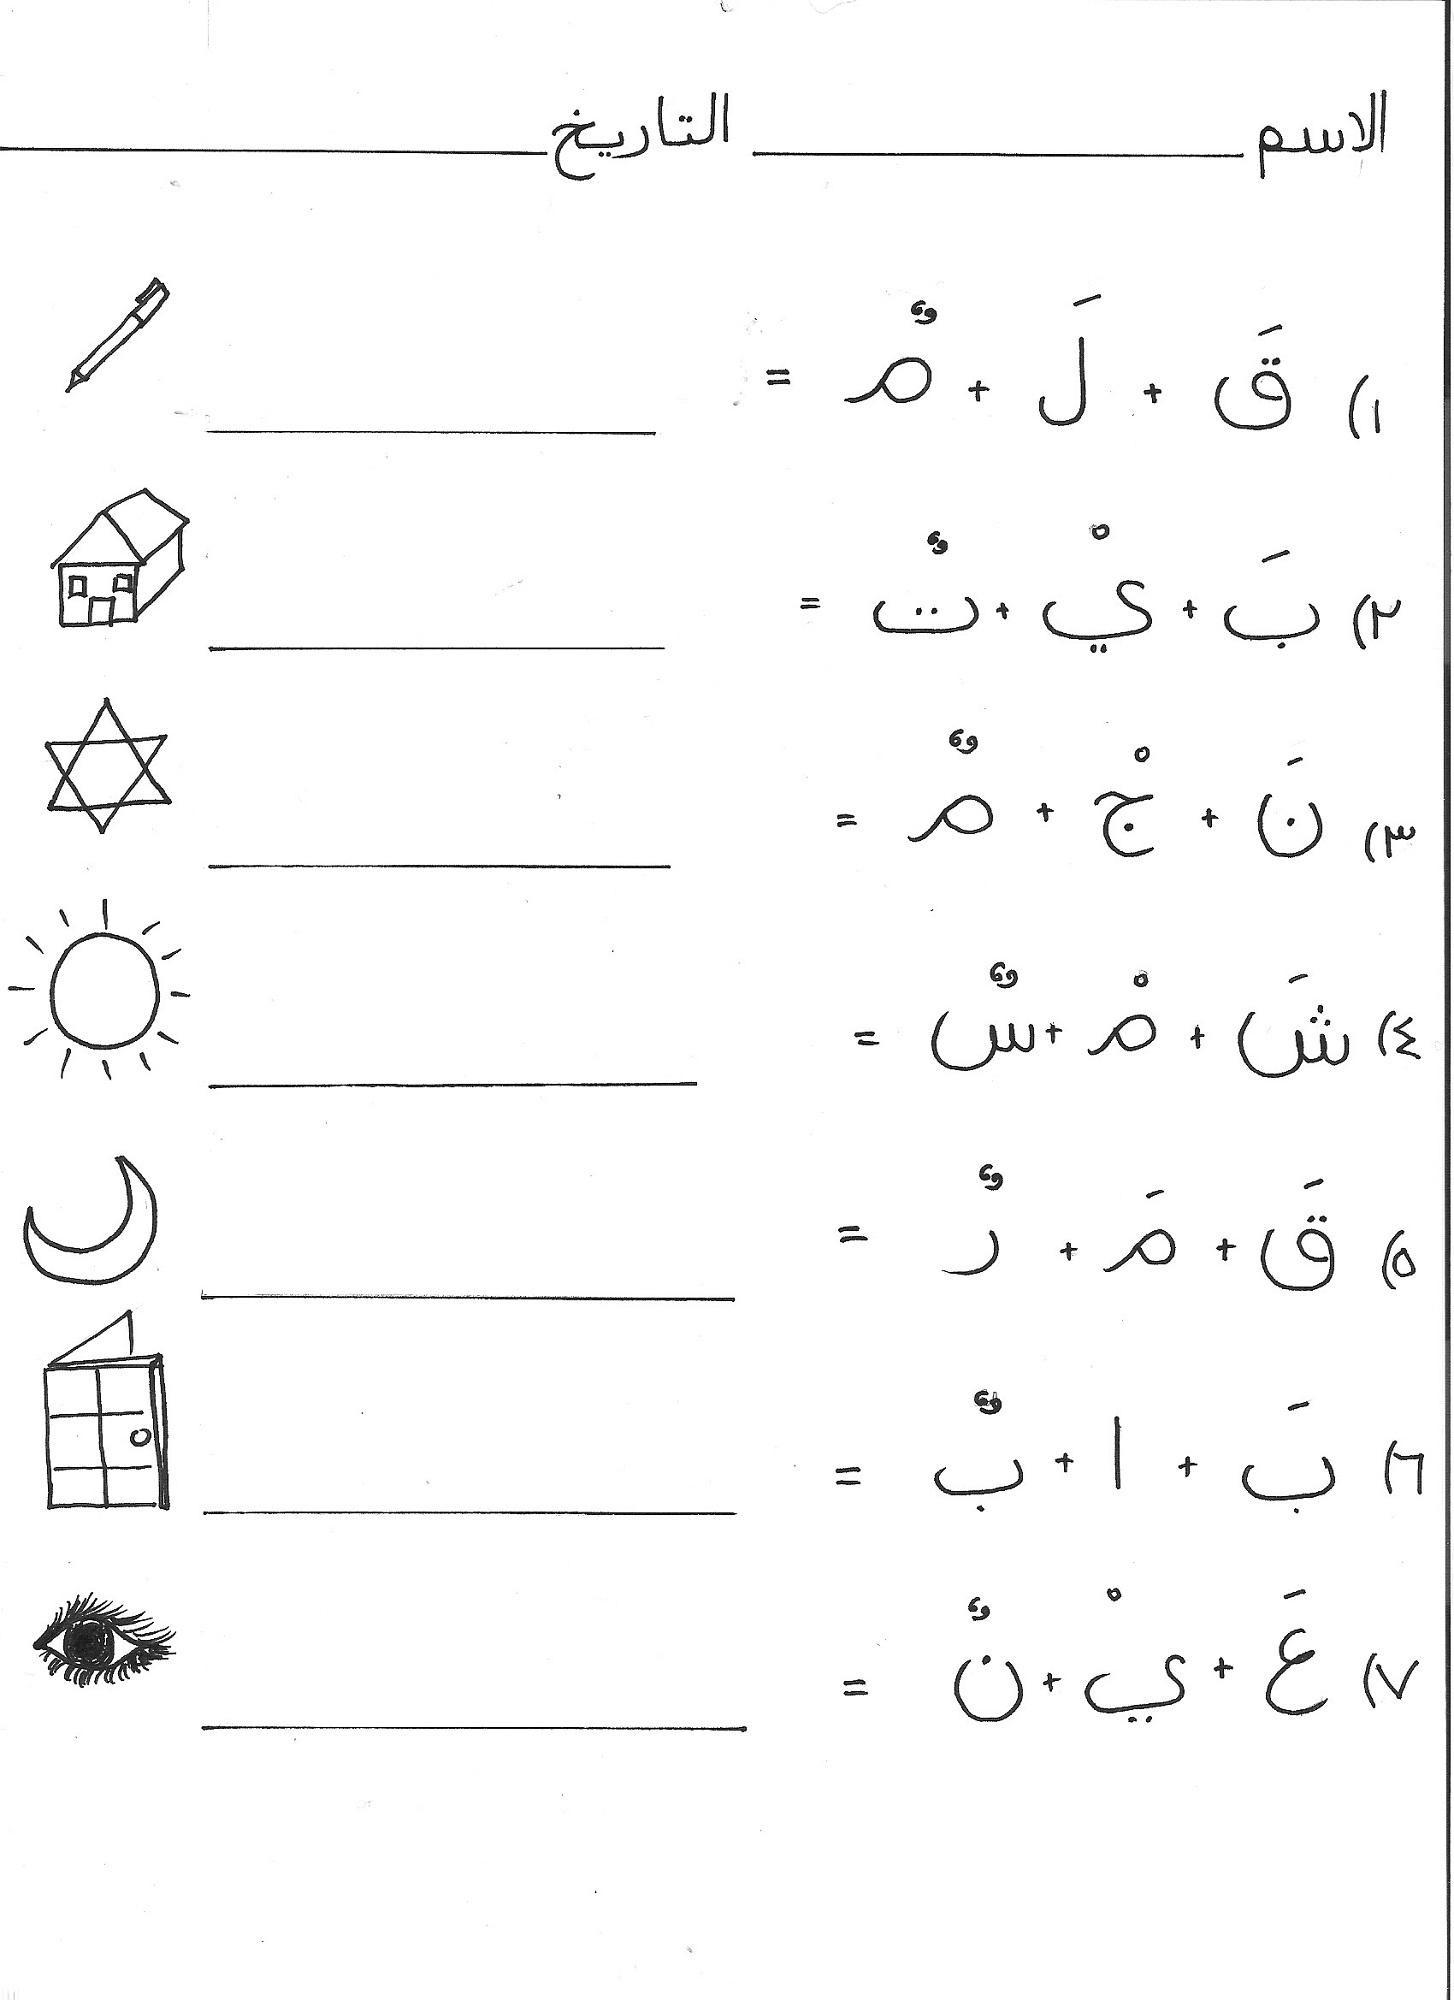 Free Printable Missing Alphabet Letter Worksheets Letter